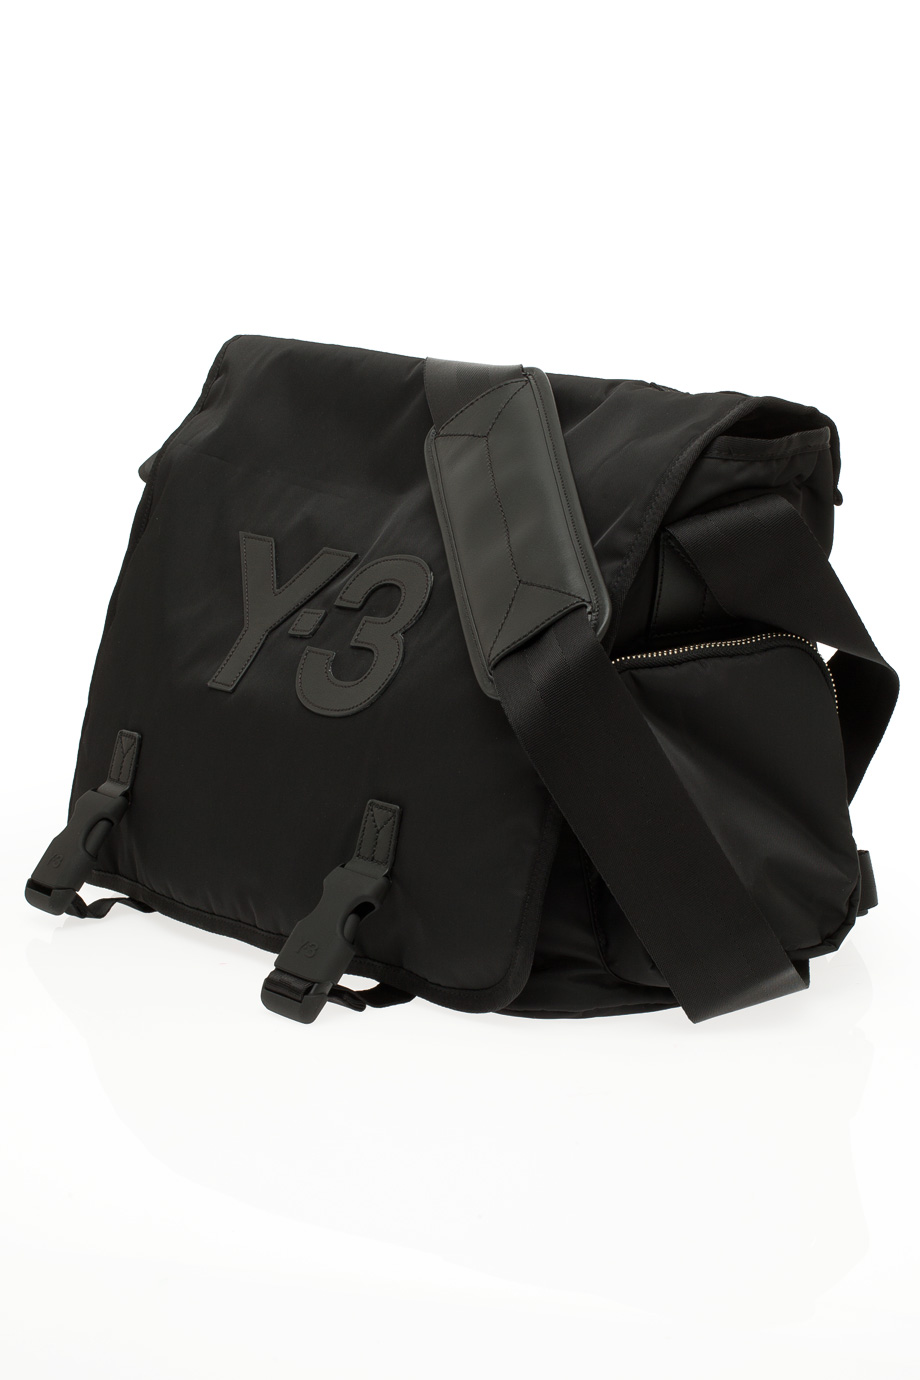 Y 3 Day Messenger Bag In Black Lyst